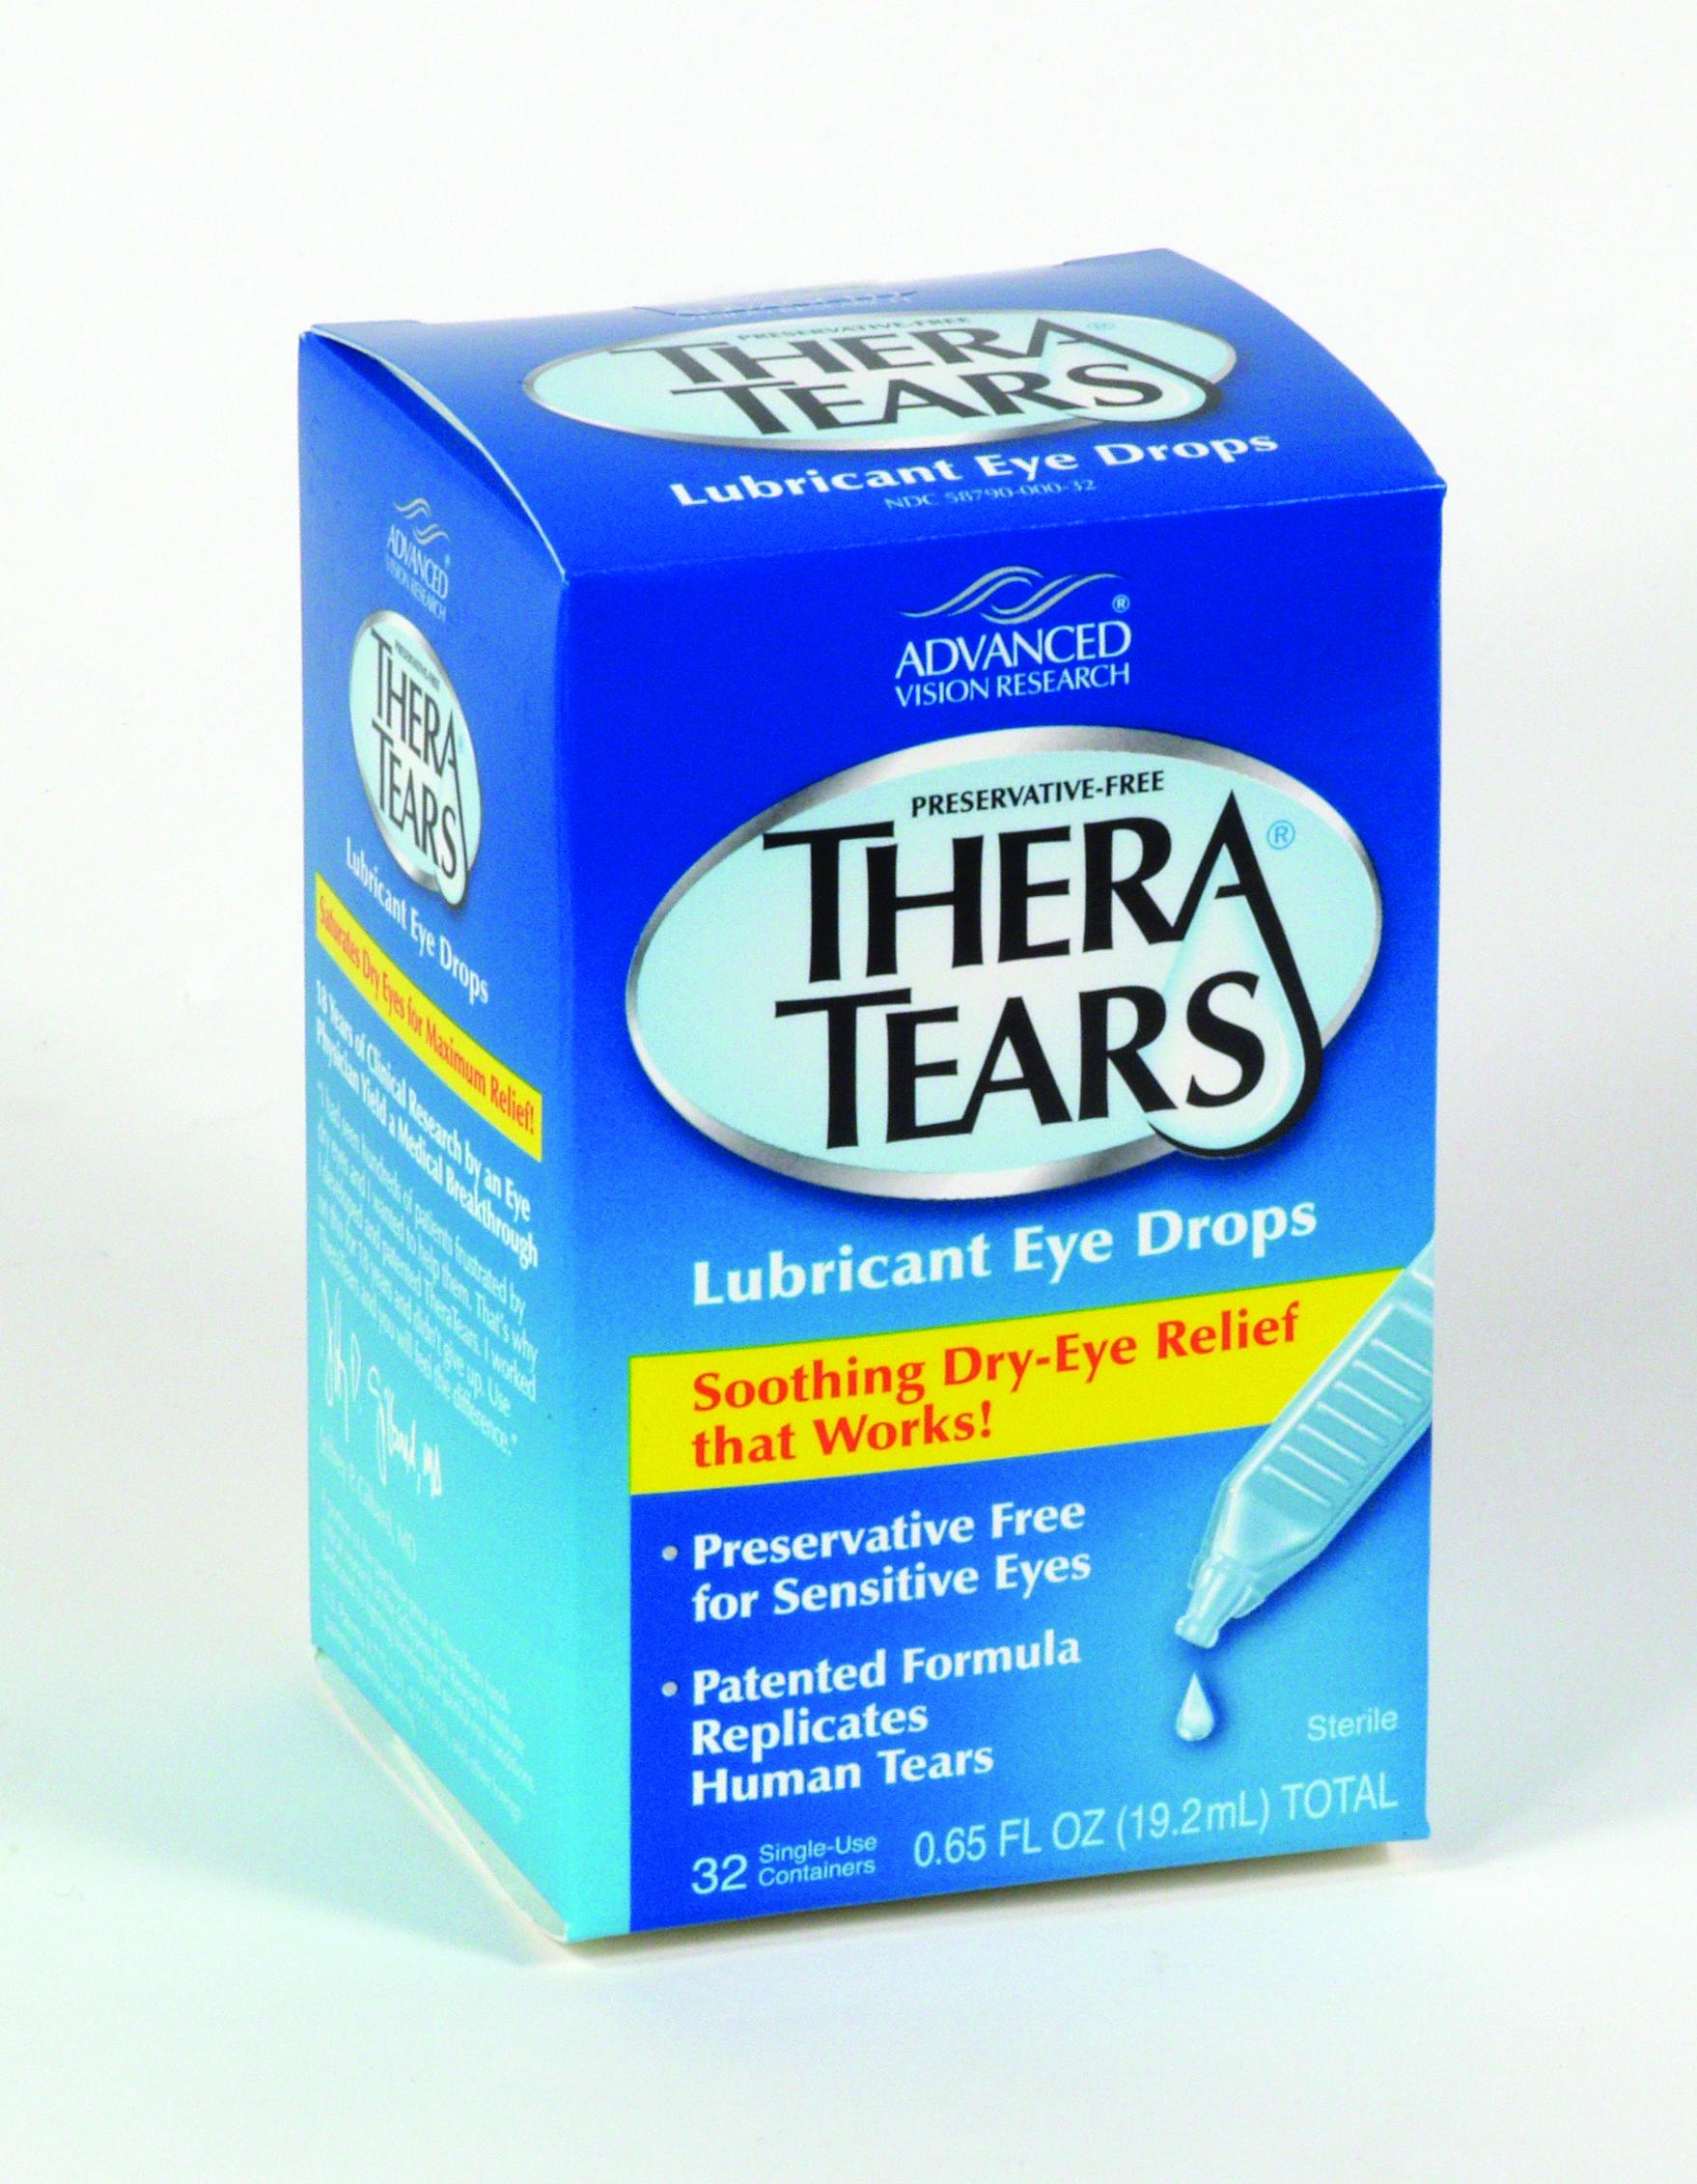 Thera Tears Eye Drops